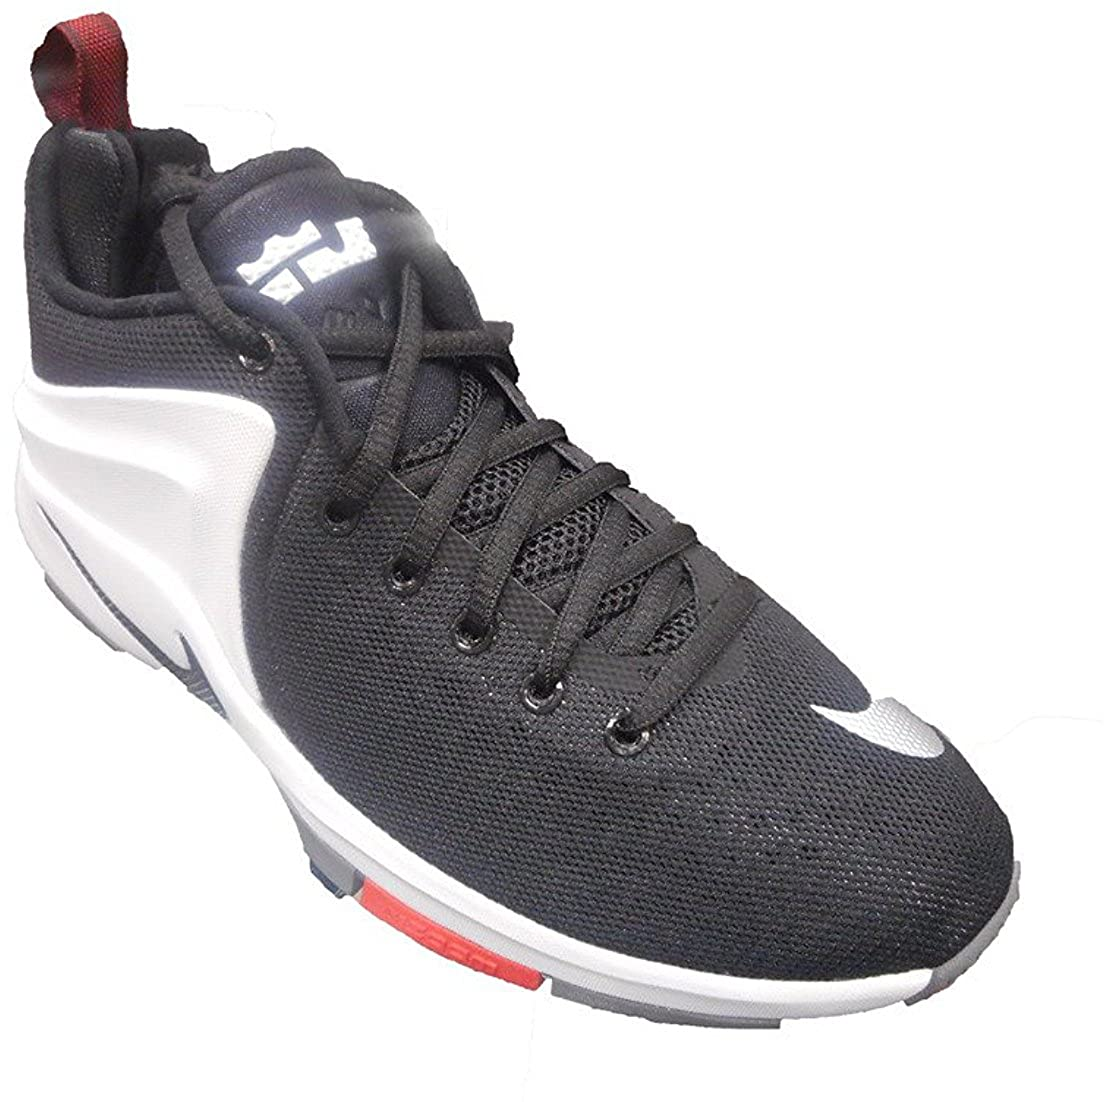 : Nike Boys Zoom Witness (GS) Basketball Shoes: Shoes